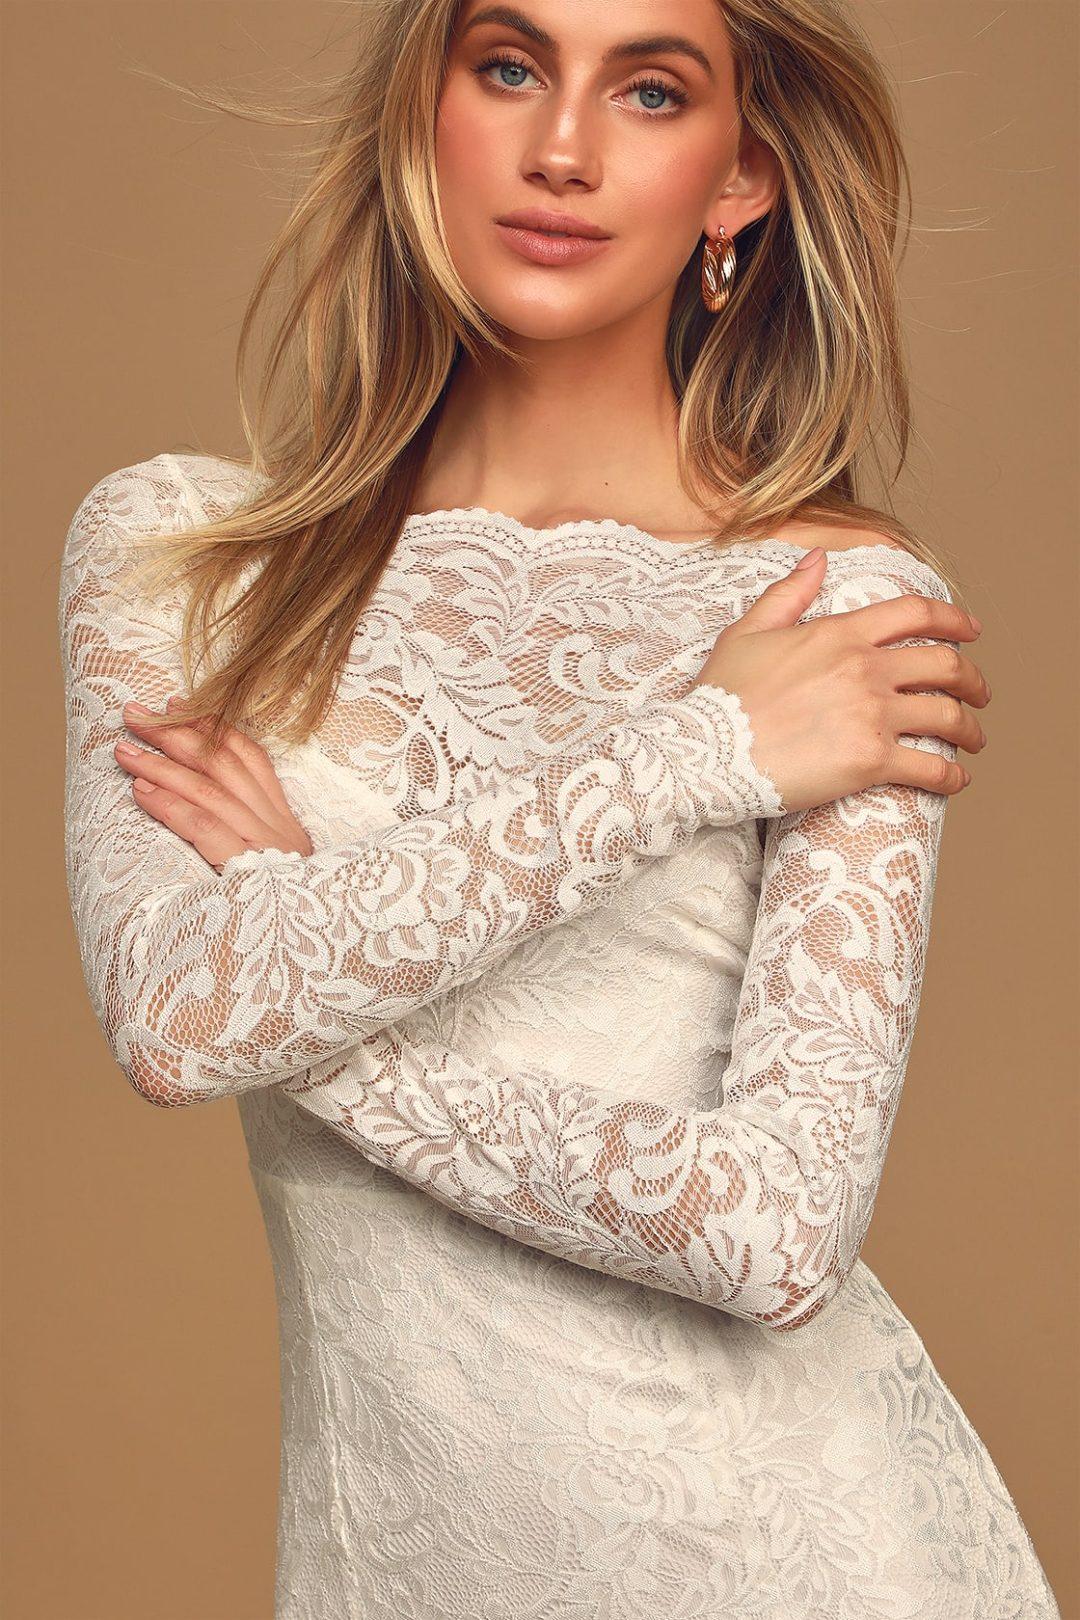 Affordable Kate Middleton inspired long sleeve lace wedding dress under $100